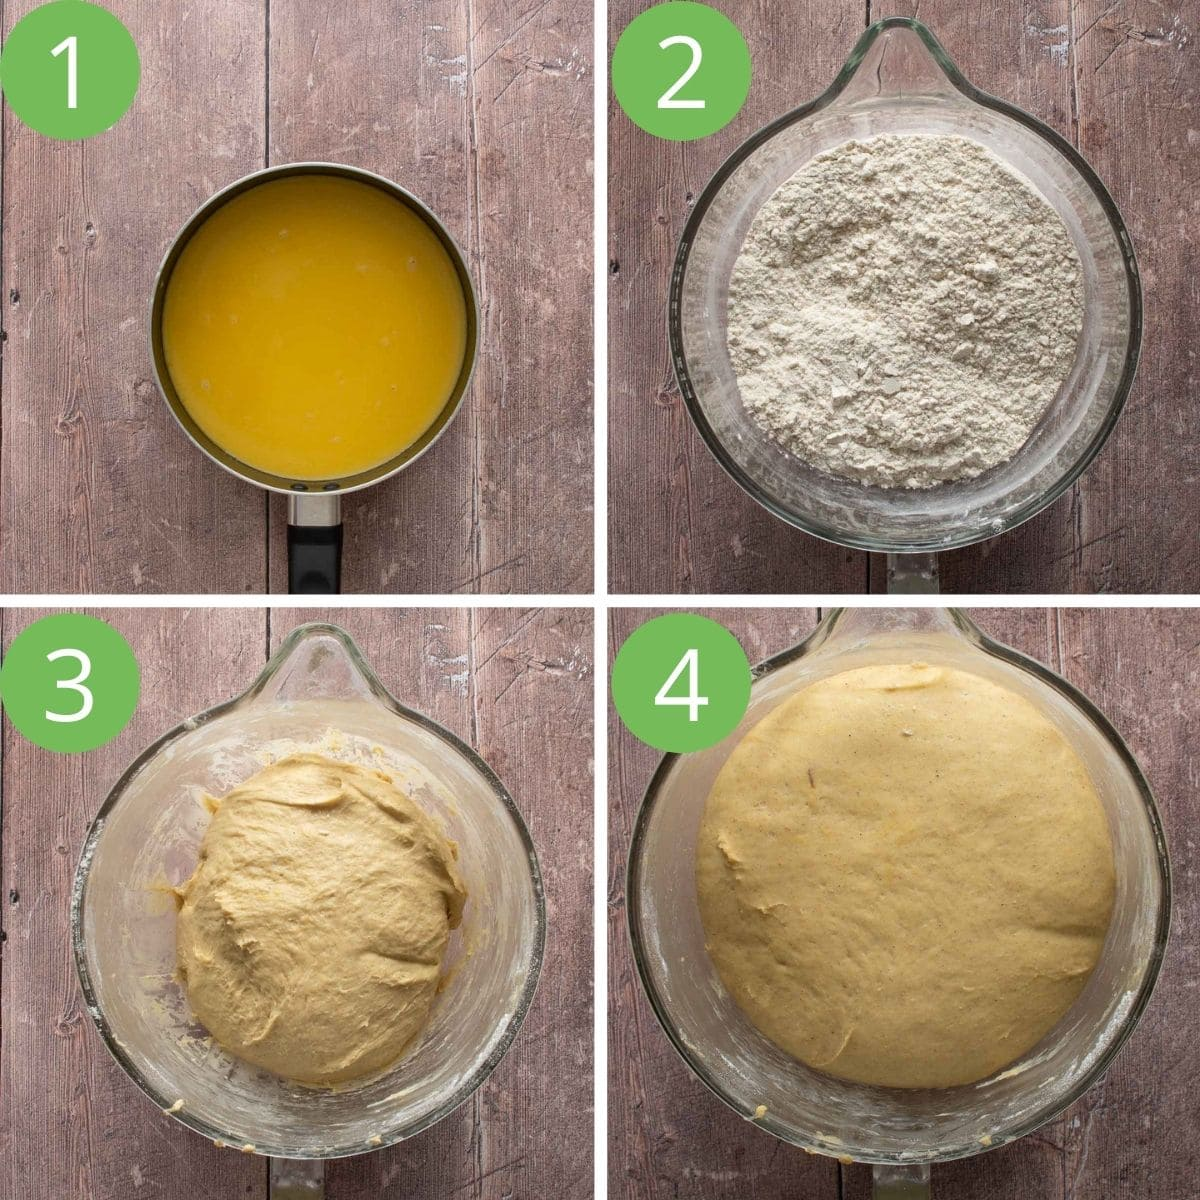 Step by step images showing how to make scandinavian saffron bun dough.